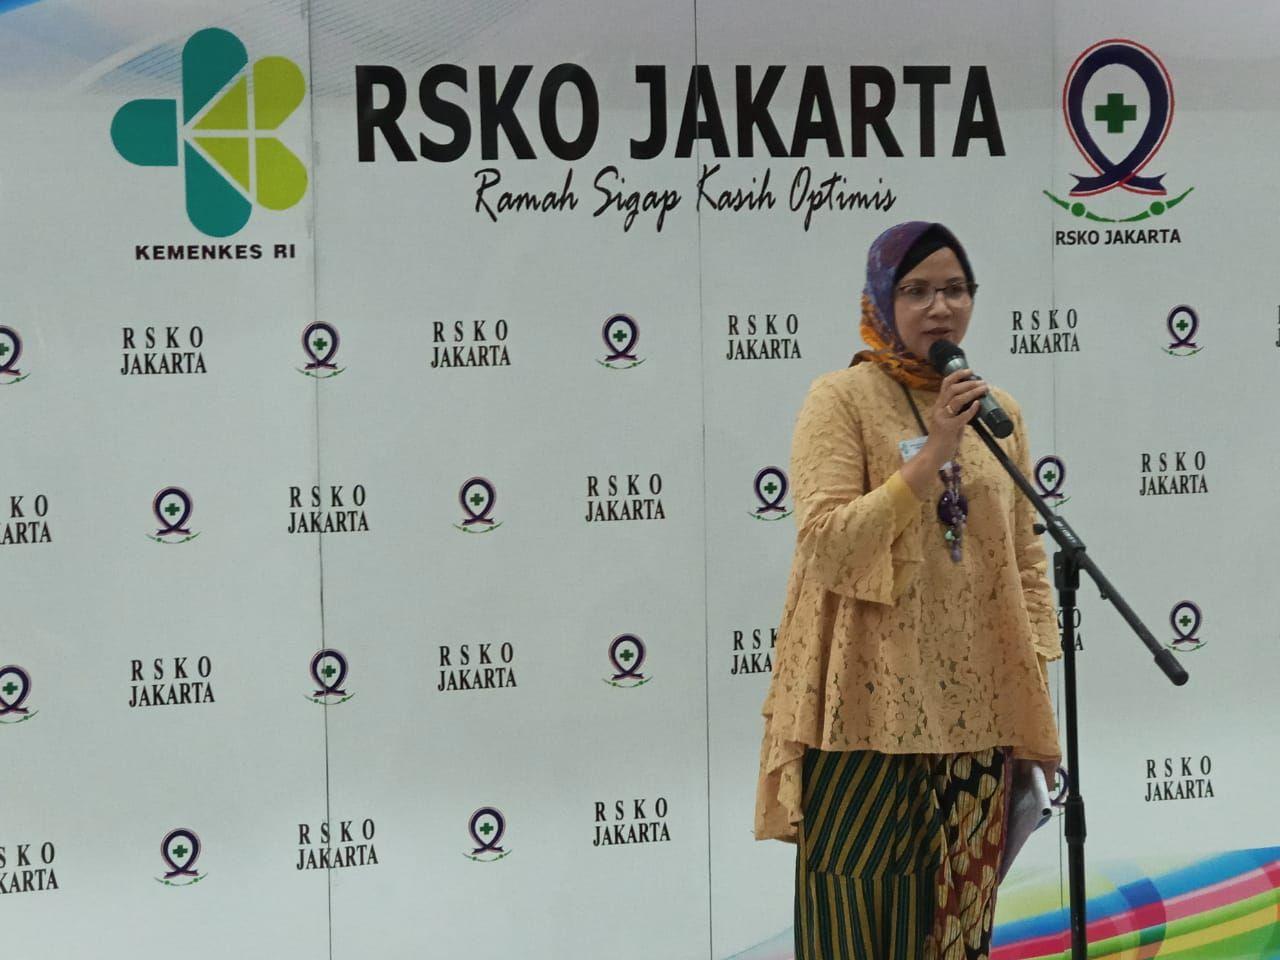 Deskripsi : ketua Dharma Wanita Persatuan RSKO Jakarta, Ibu Sri Hartanti Azhar menyampaikan Dharma Wanita Persatuan RSKO Jakarta siap menjadi fasilitator I Sumber : RSKO Jakarta